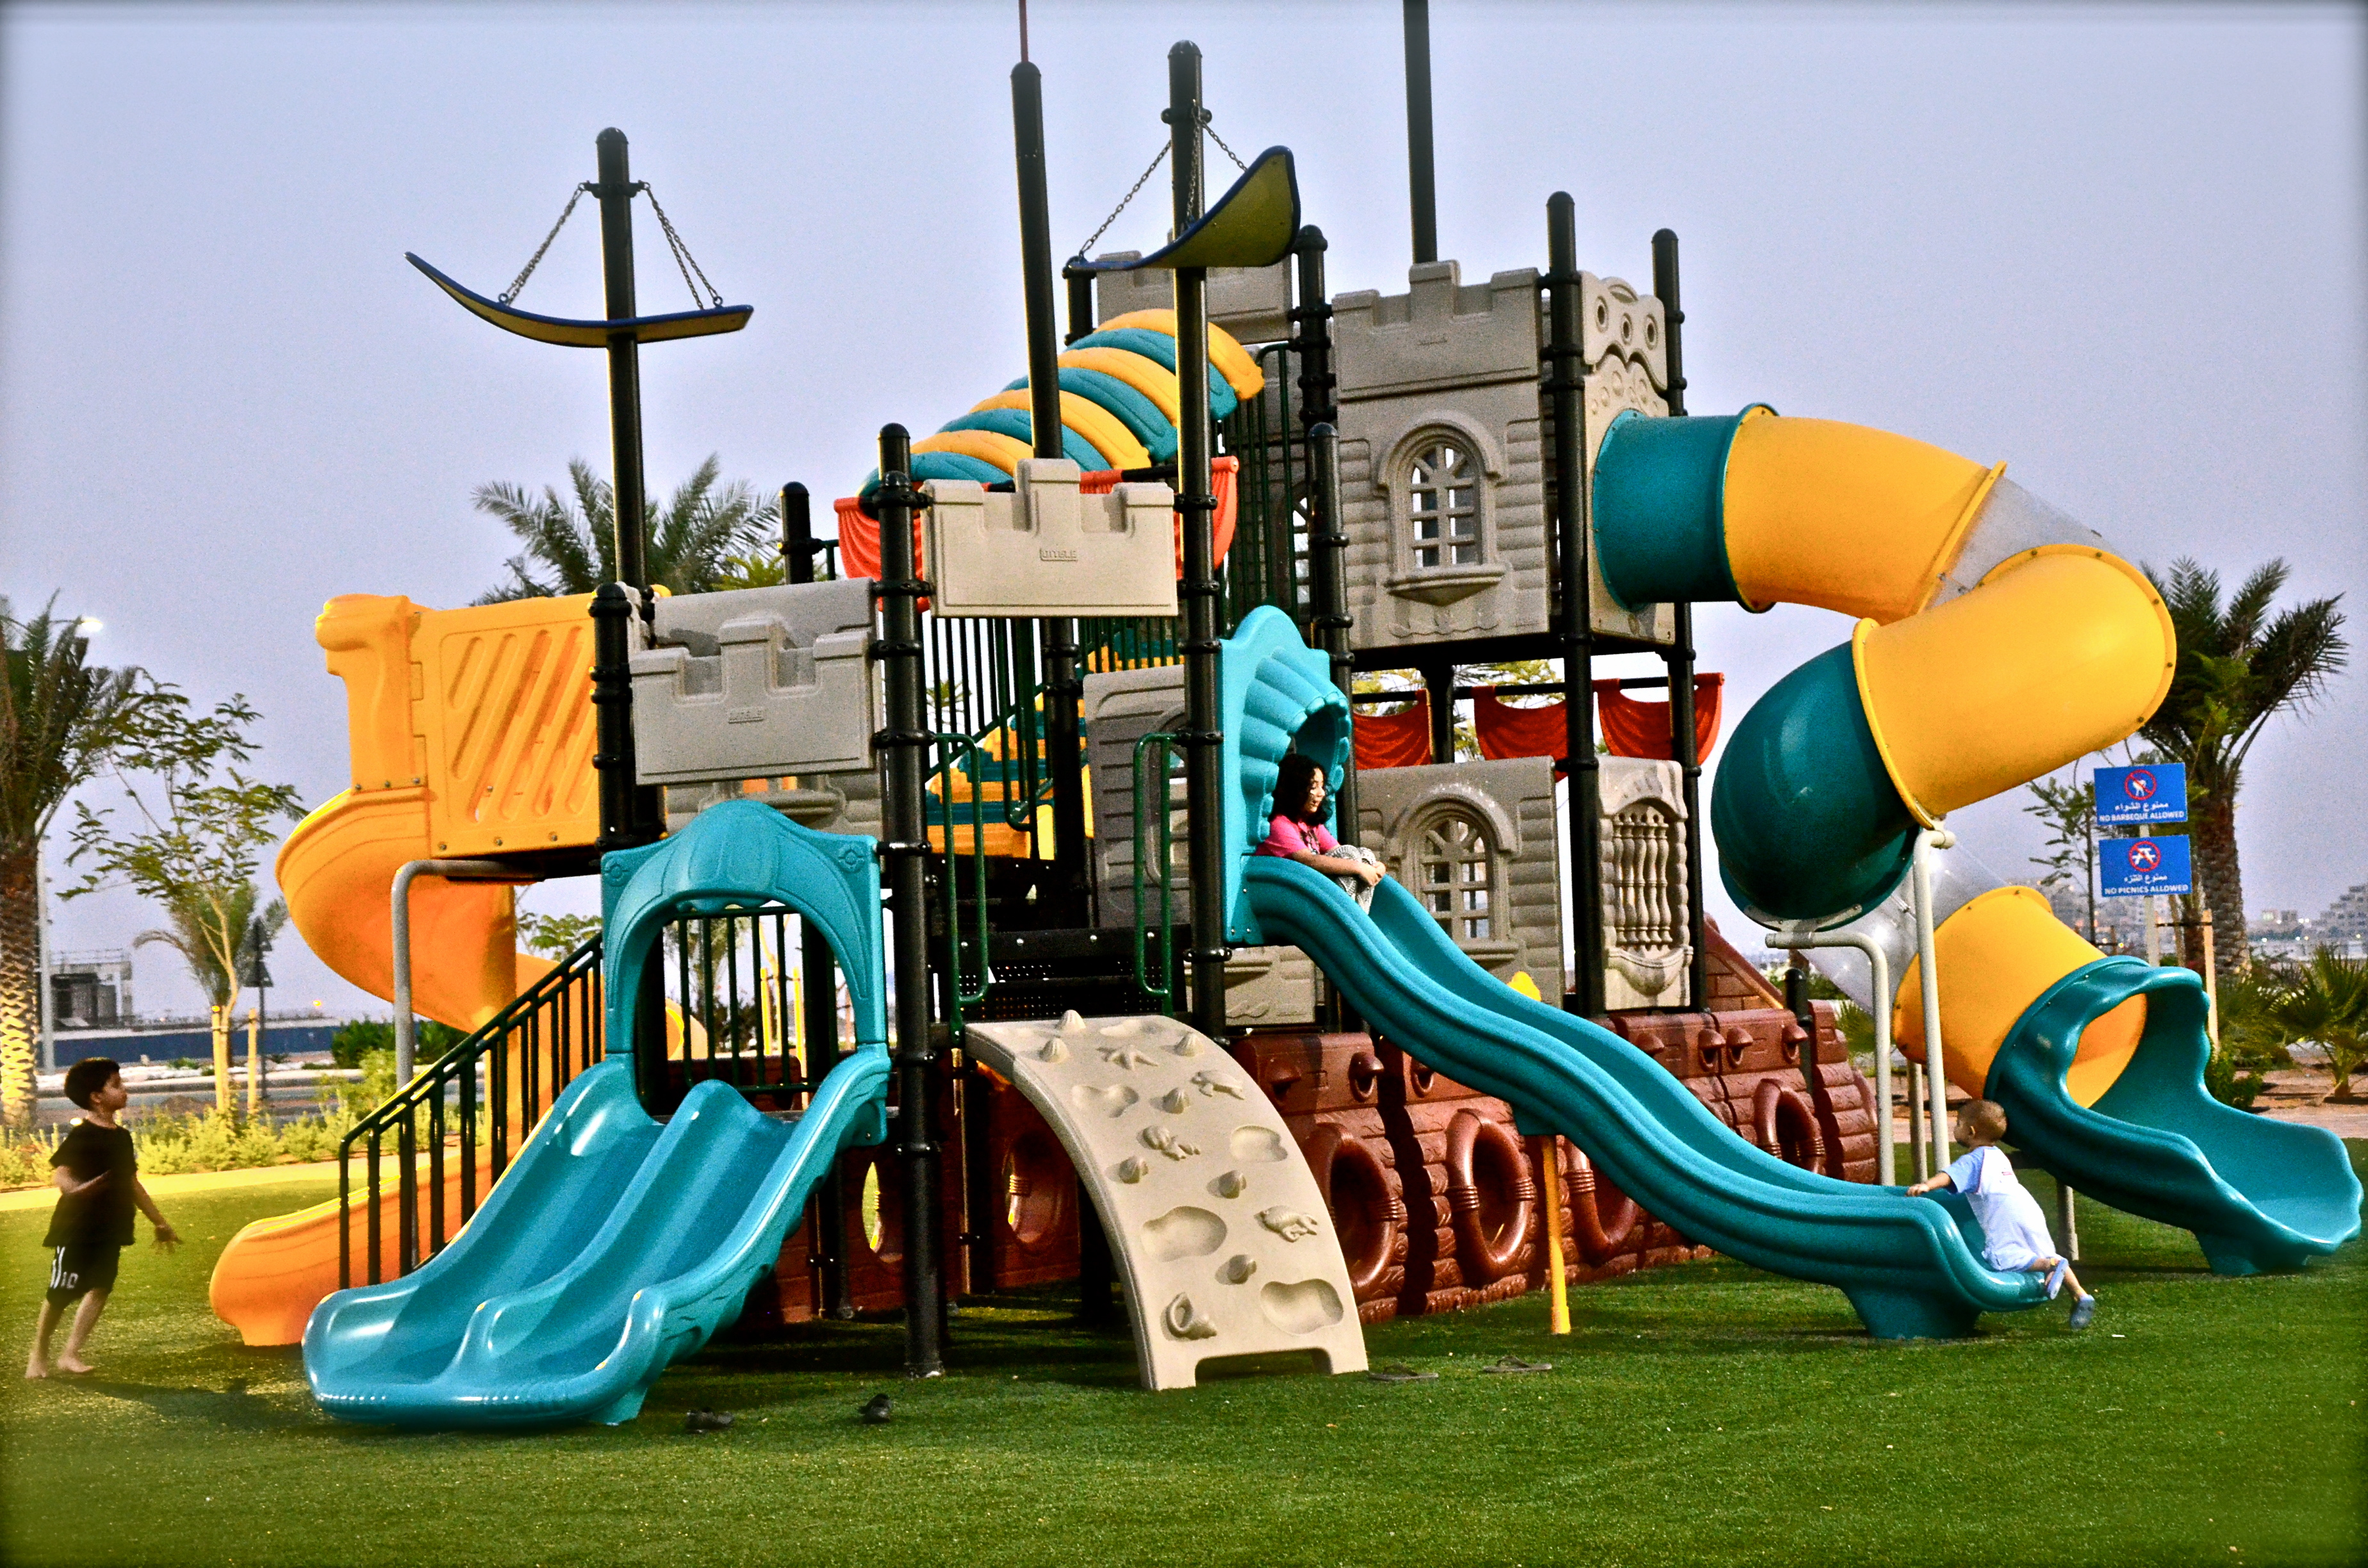 Outdoor Kids play area located inside Marjan resort